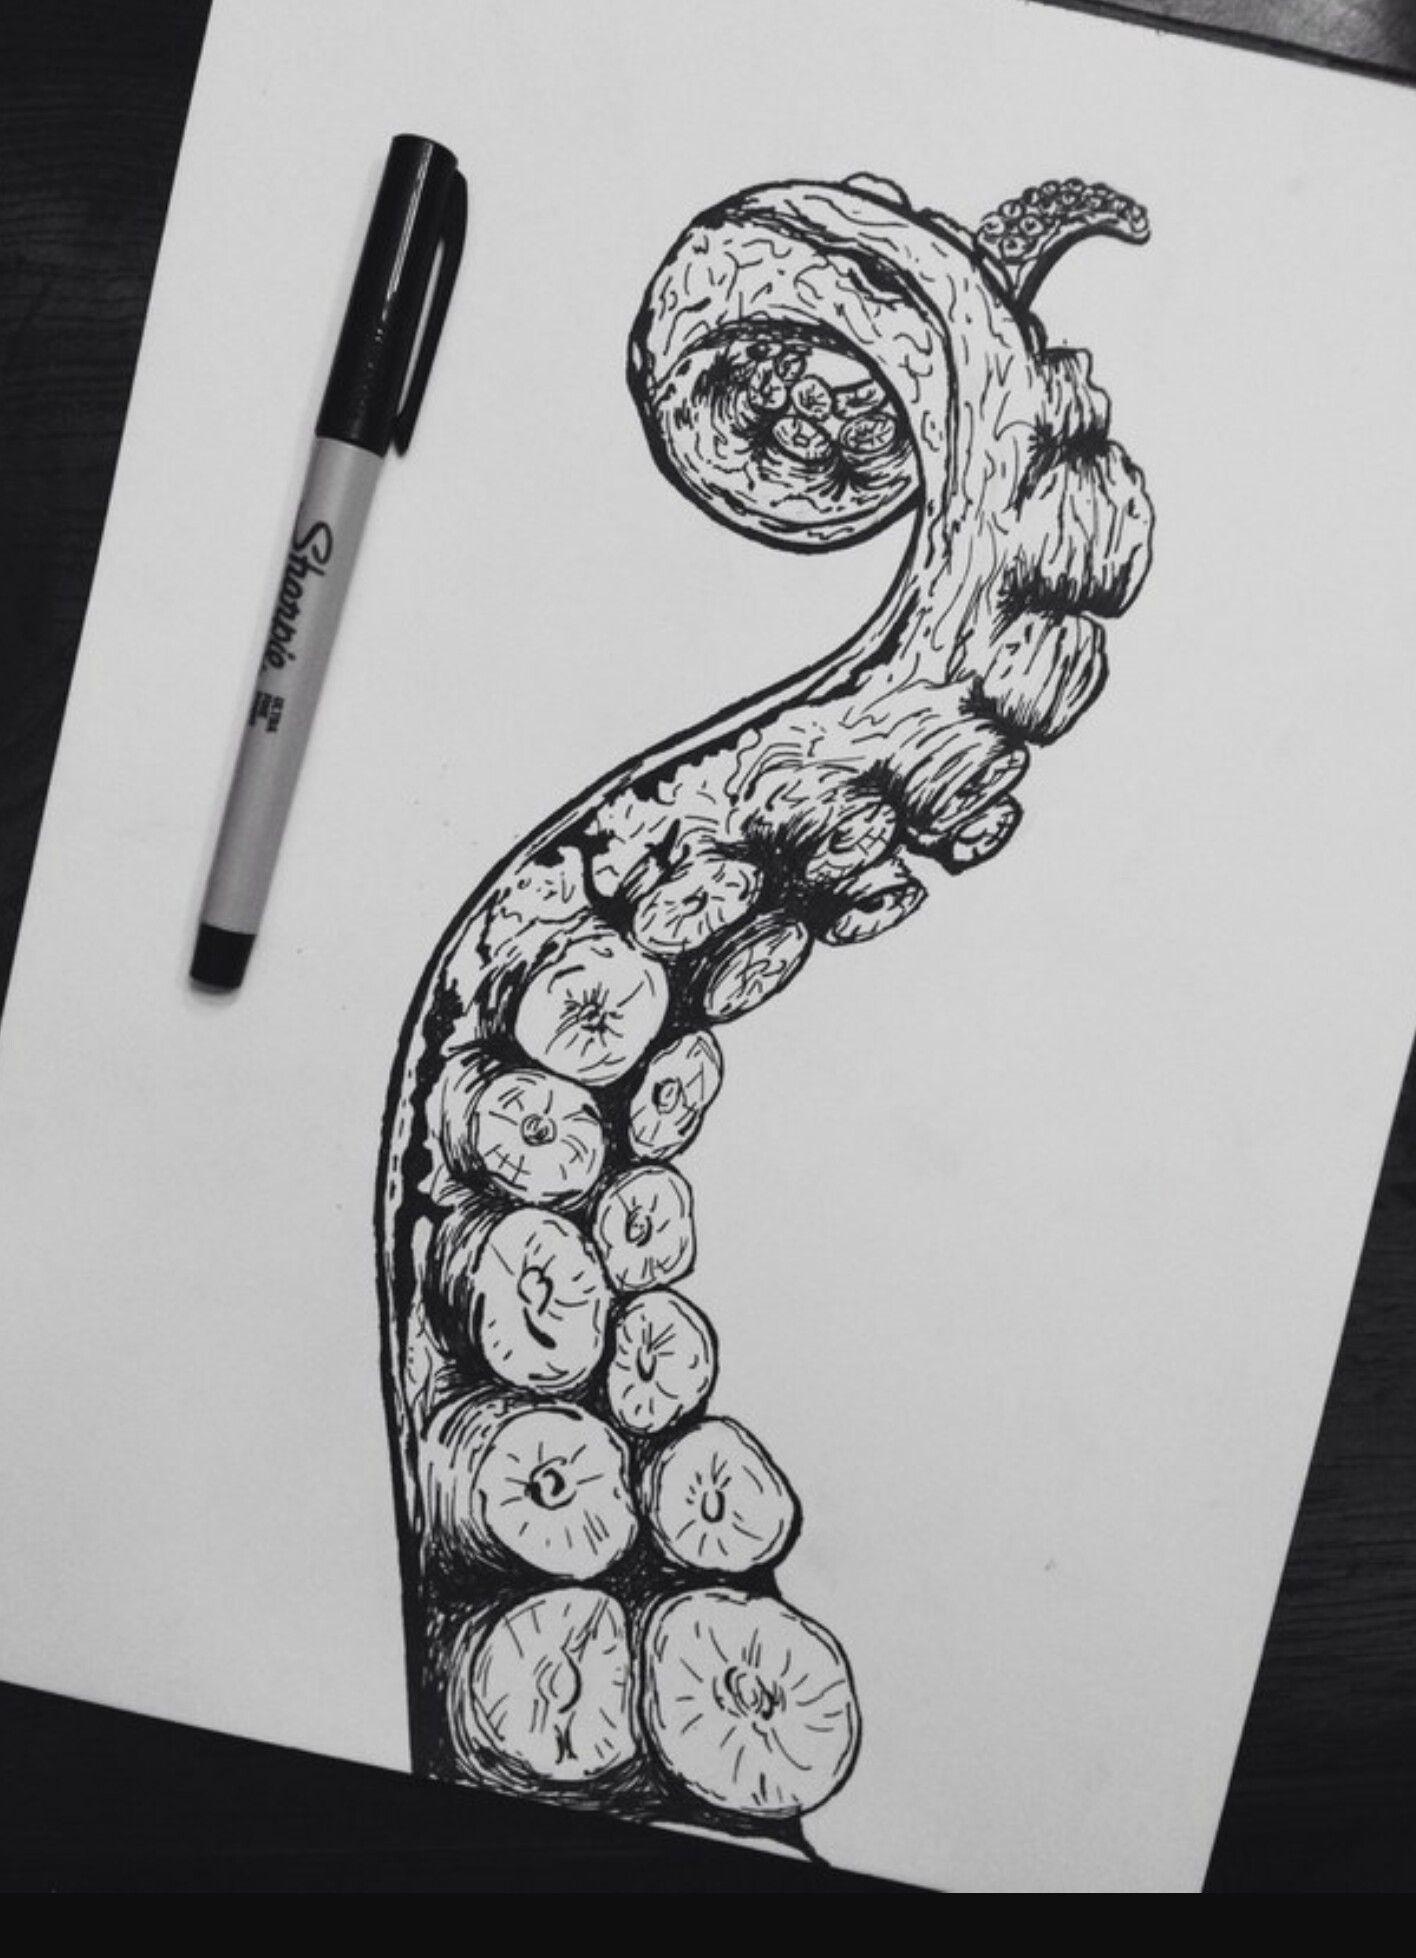 Realismo Pulpo Arte Del Tatuaje Dibujar Arte Pulpos Dibujo